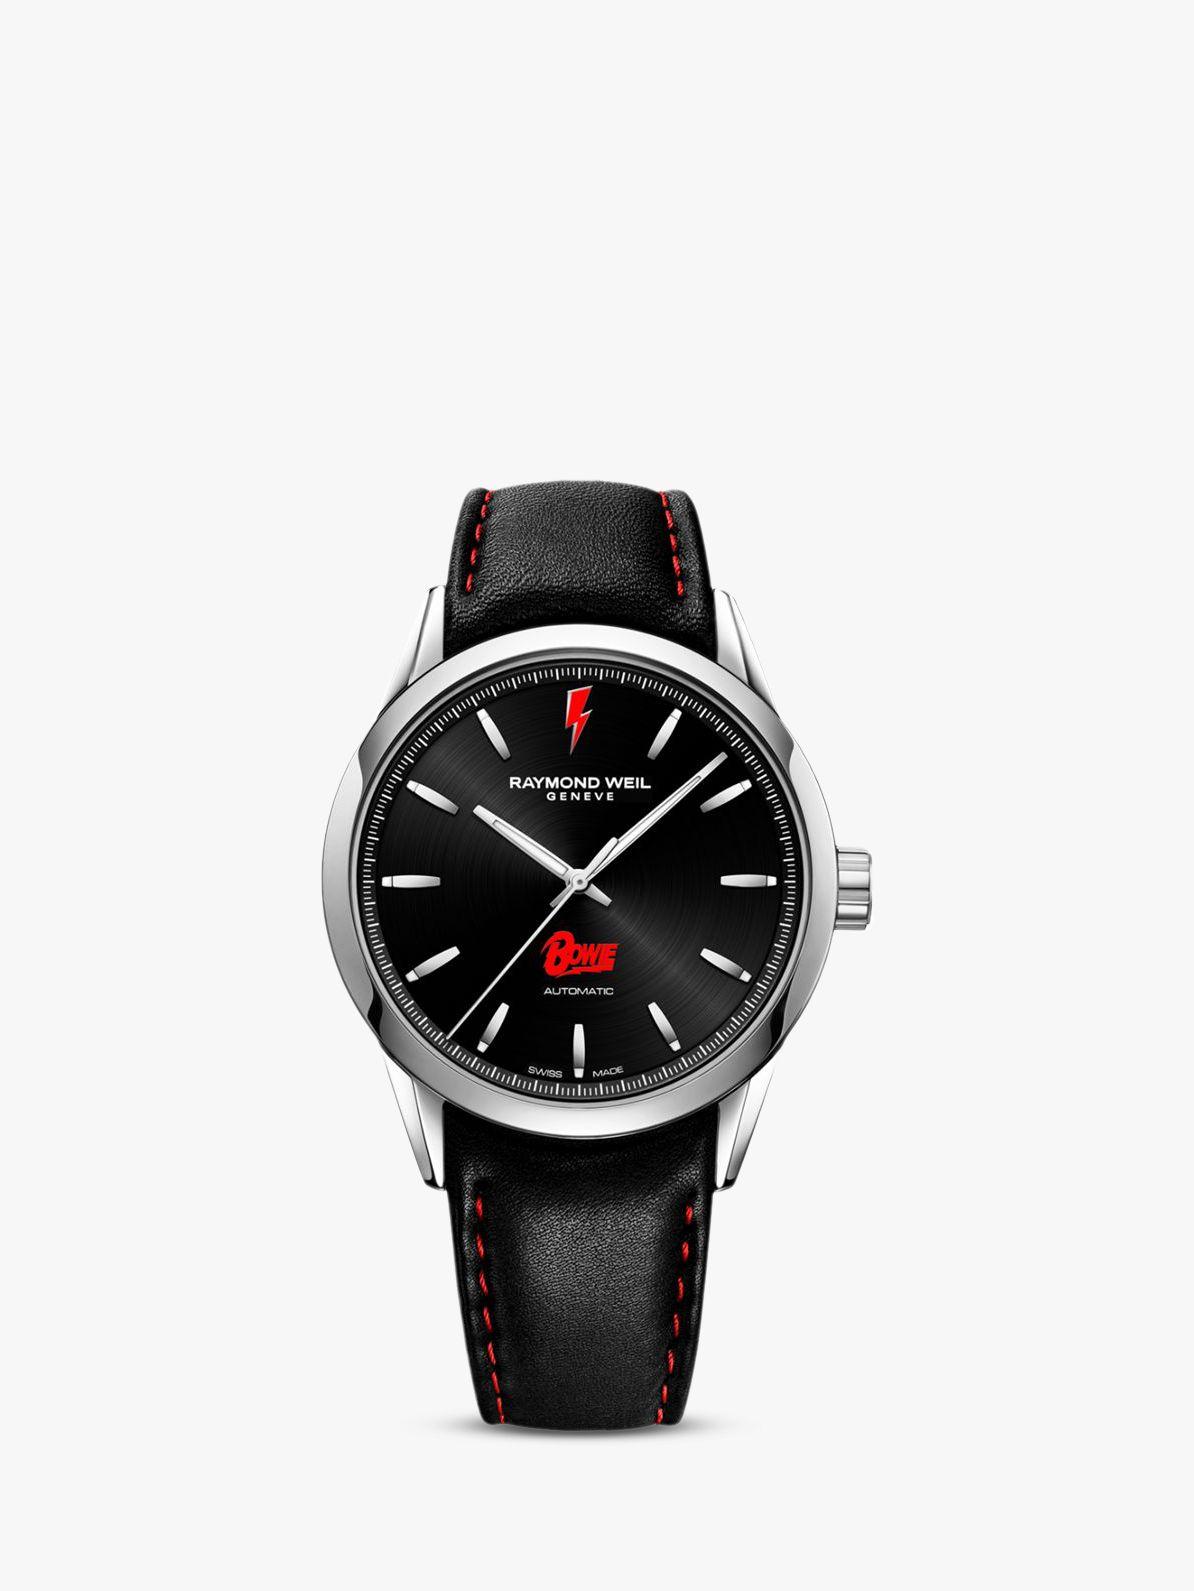 Raymond Weil Raymond Weil 2731-ST-BOW01 Men's Freelancer Bowie Limited Edition Leather Strap Watch, Black